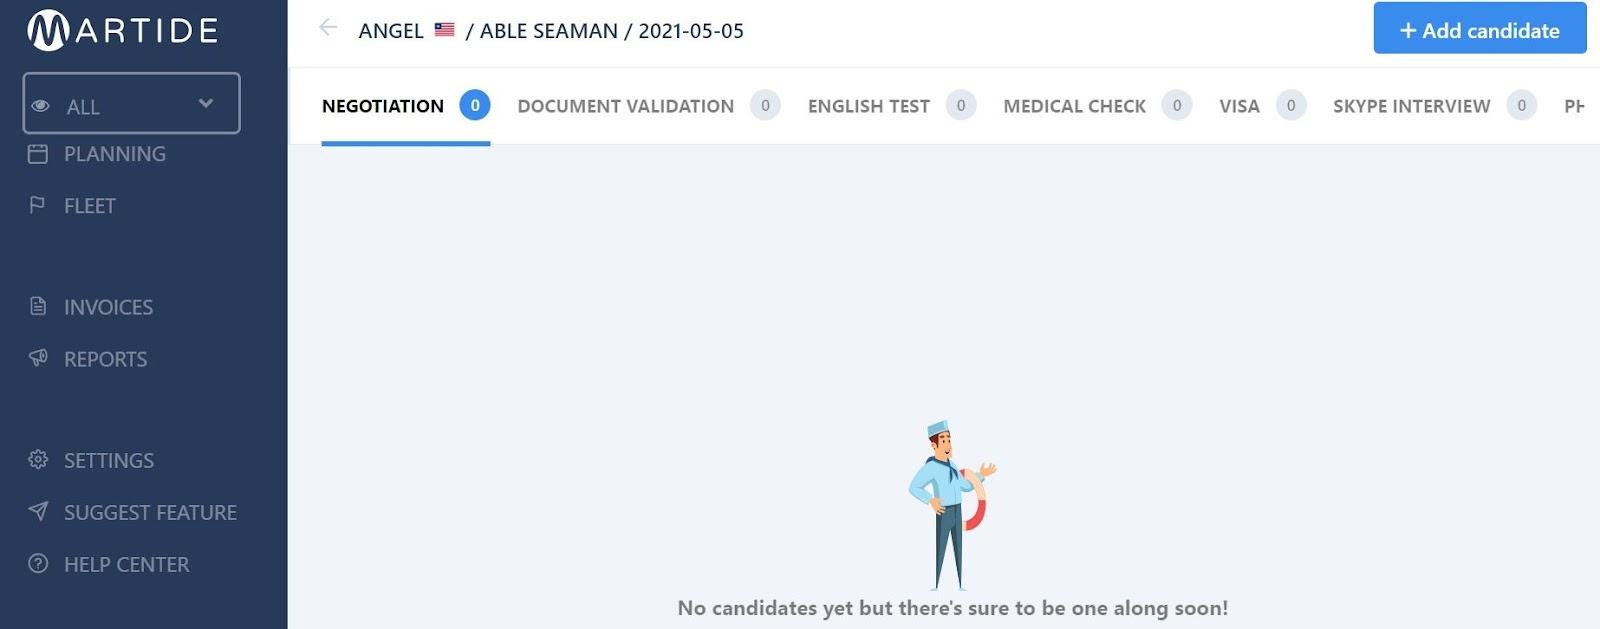 screenshot of a new job page